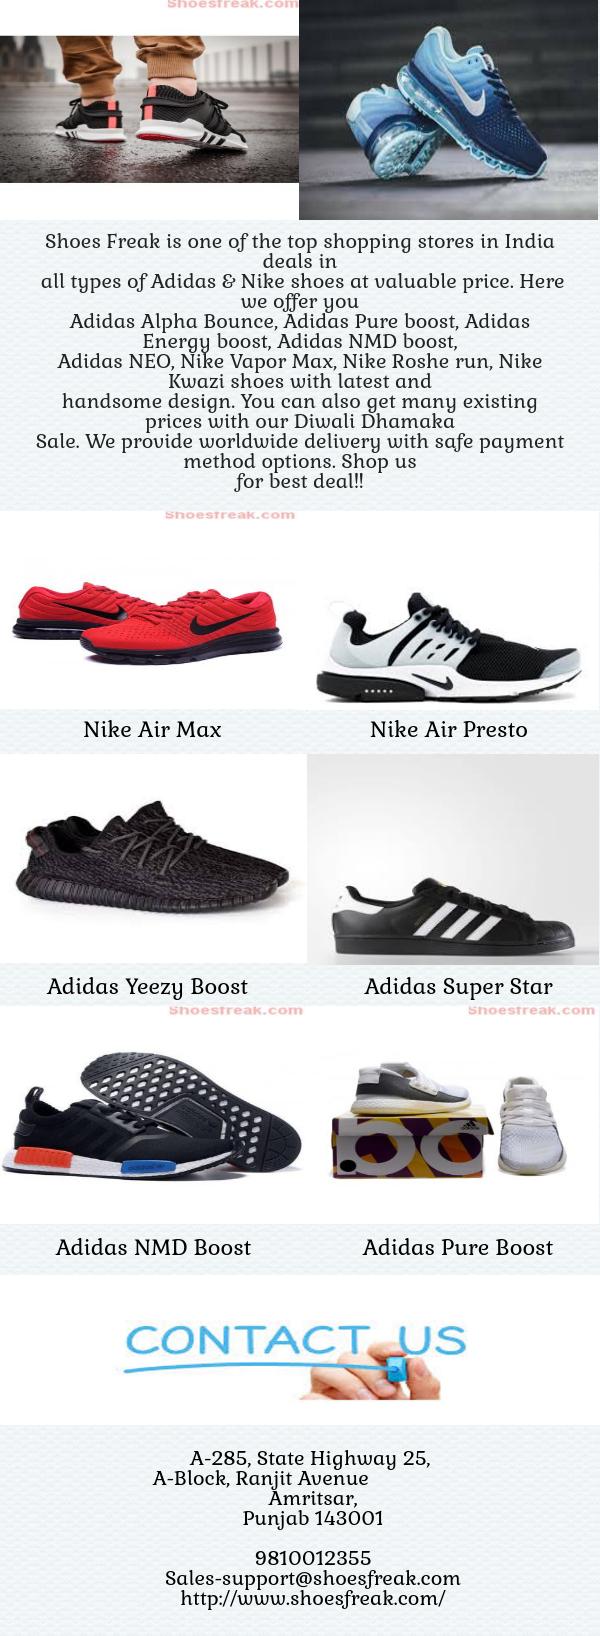 Adidas nmd boost, Adidas pure boost